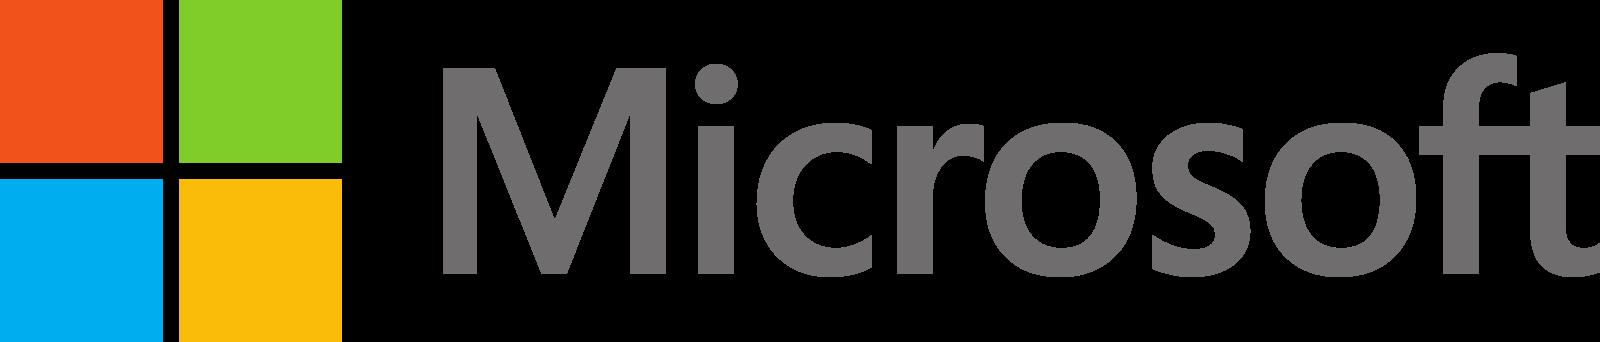 microsoft-logo-3